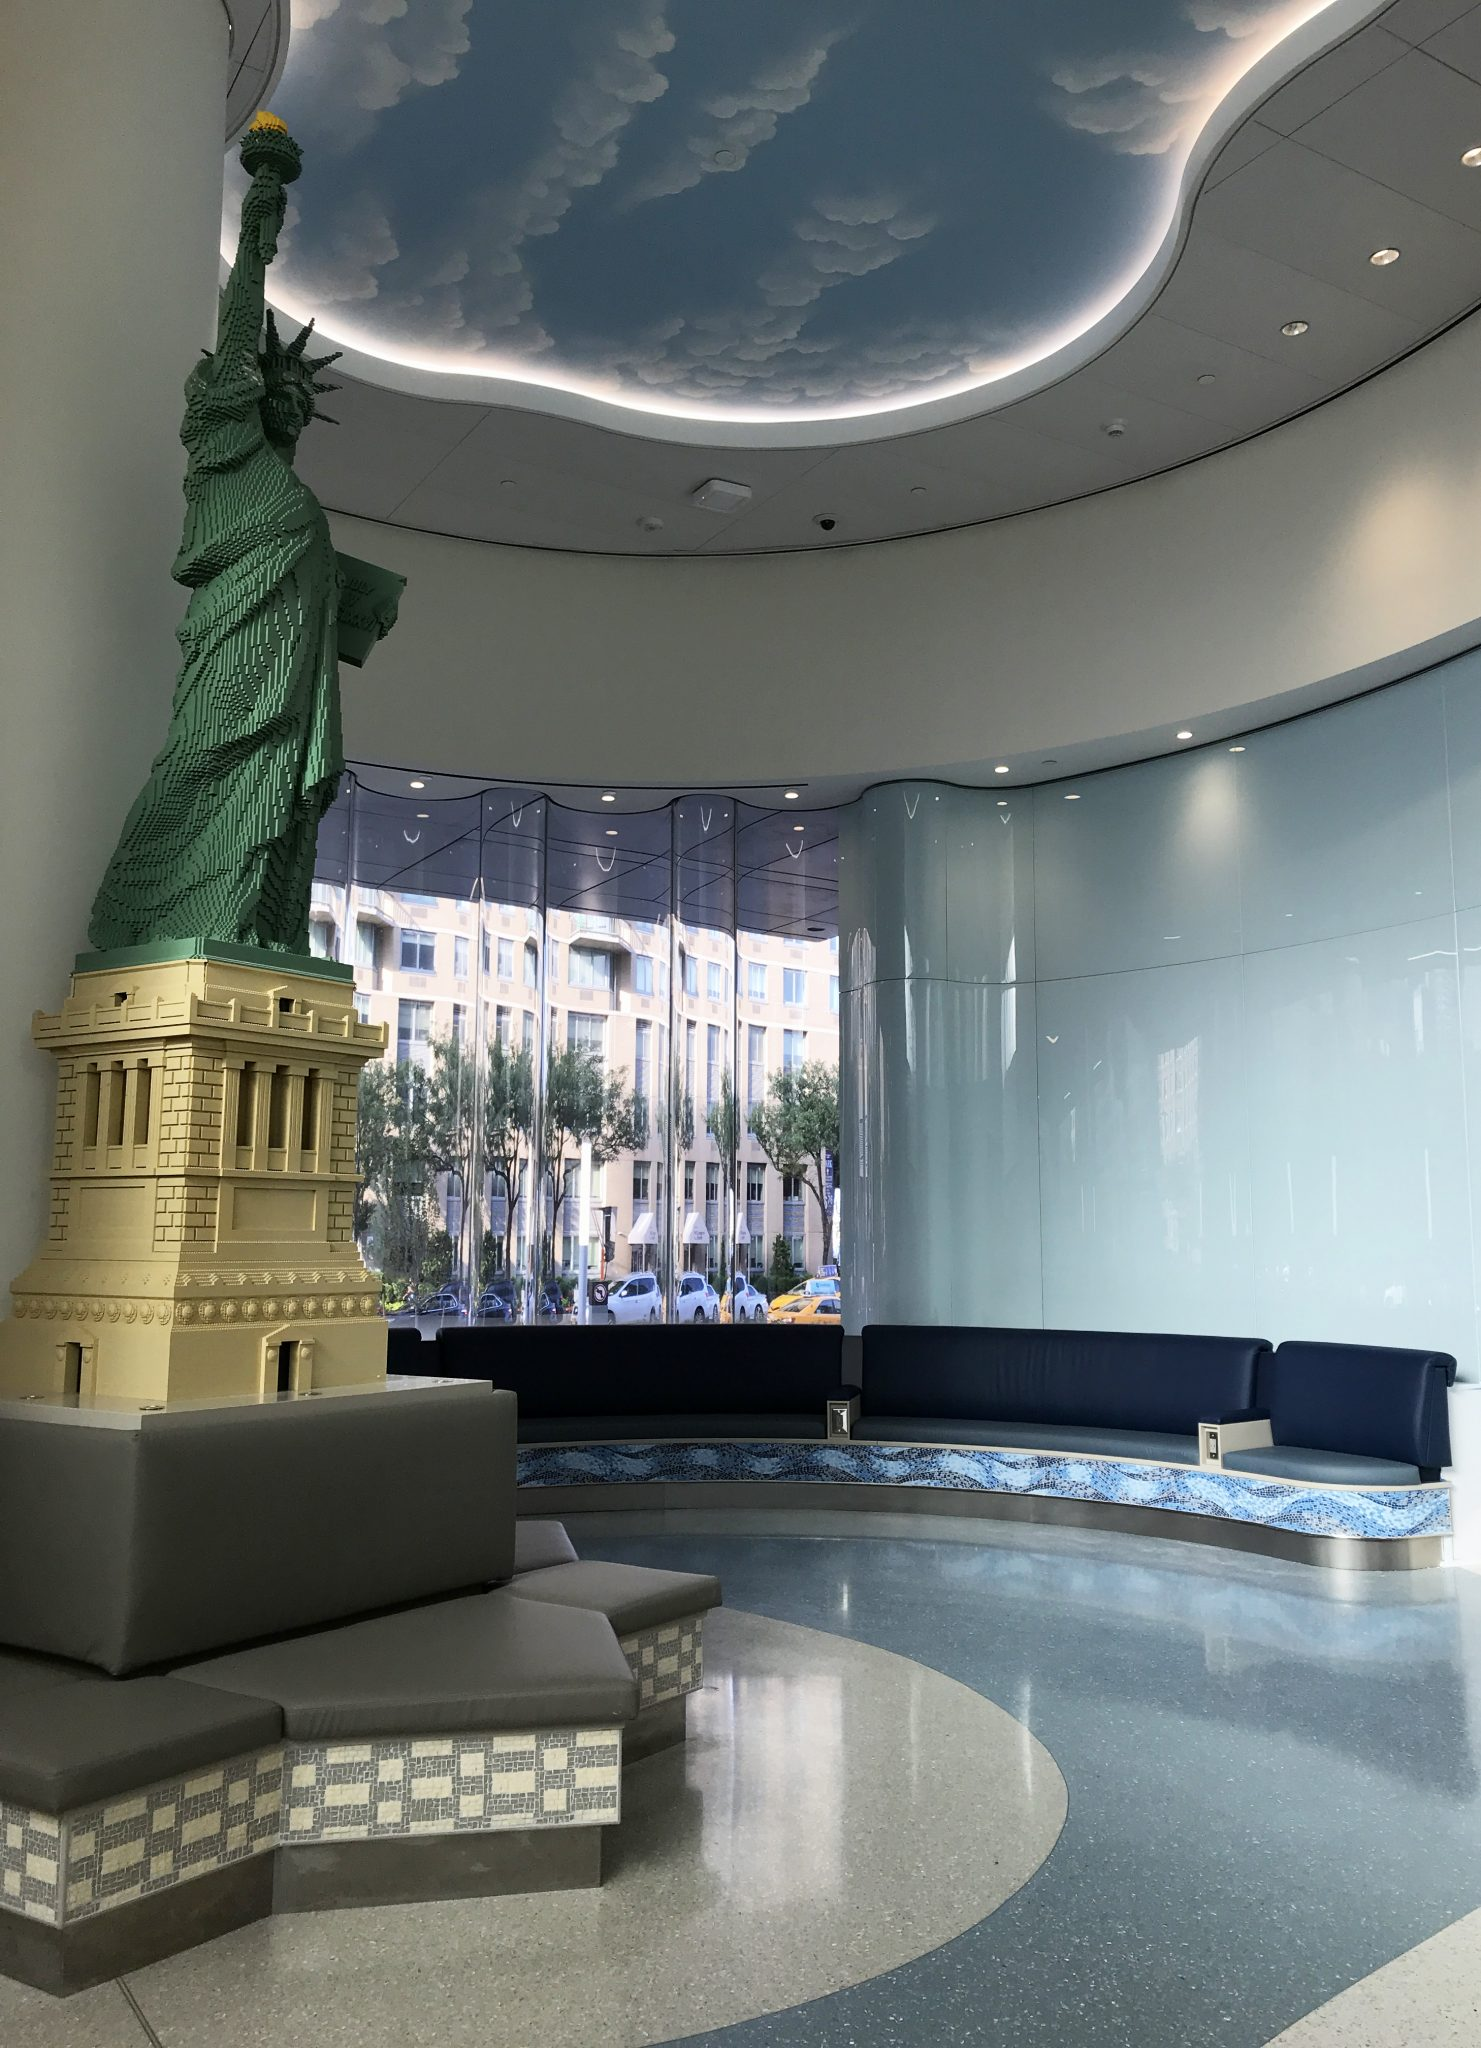 statue-of-liberty-1